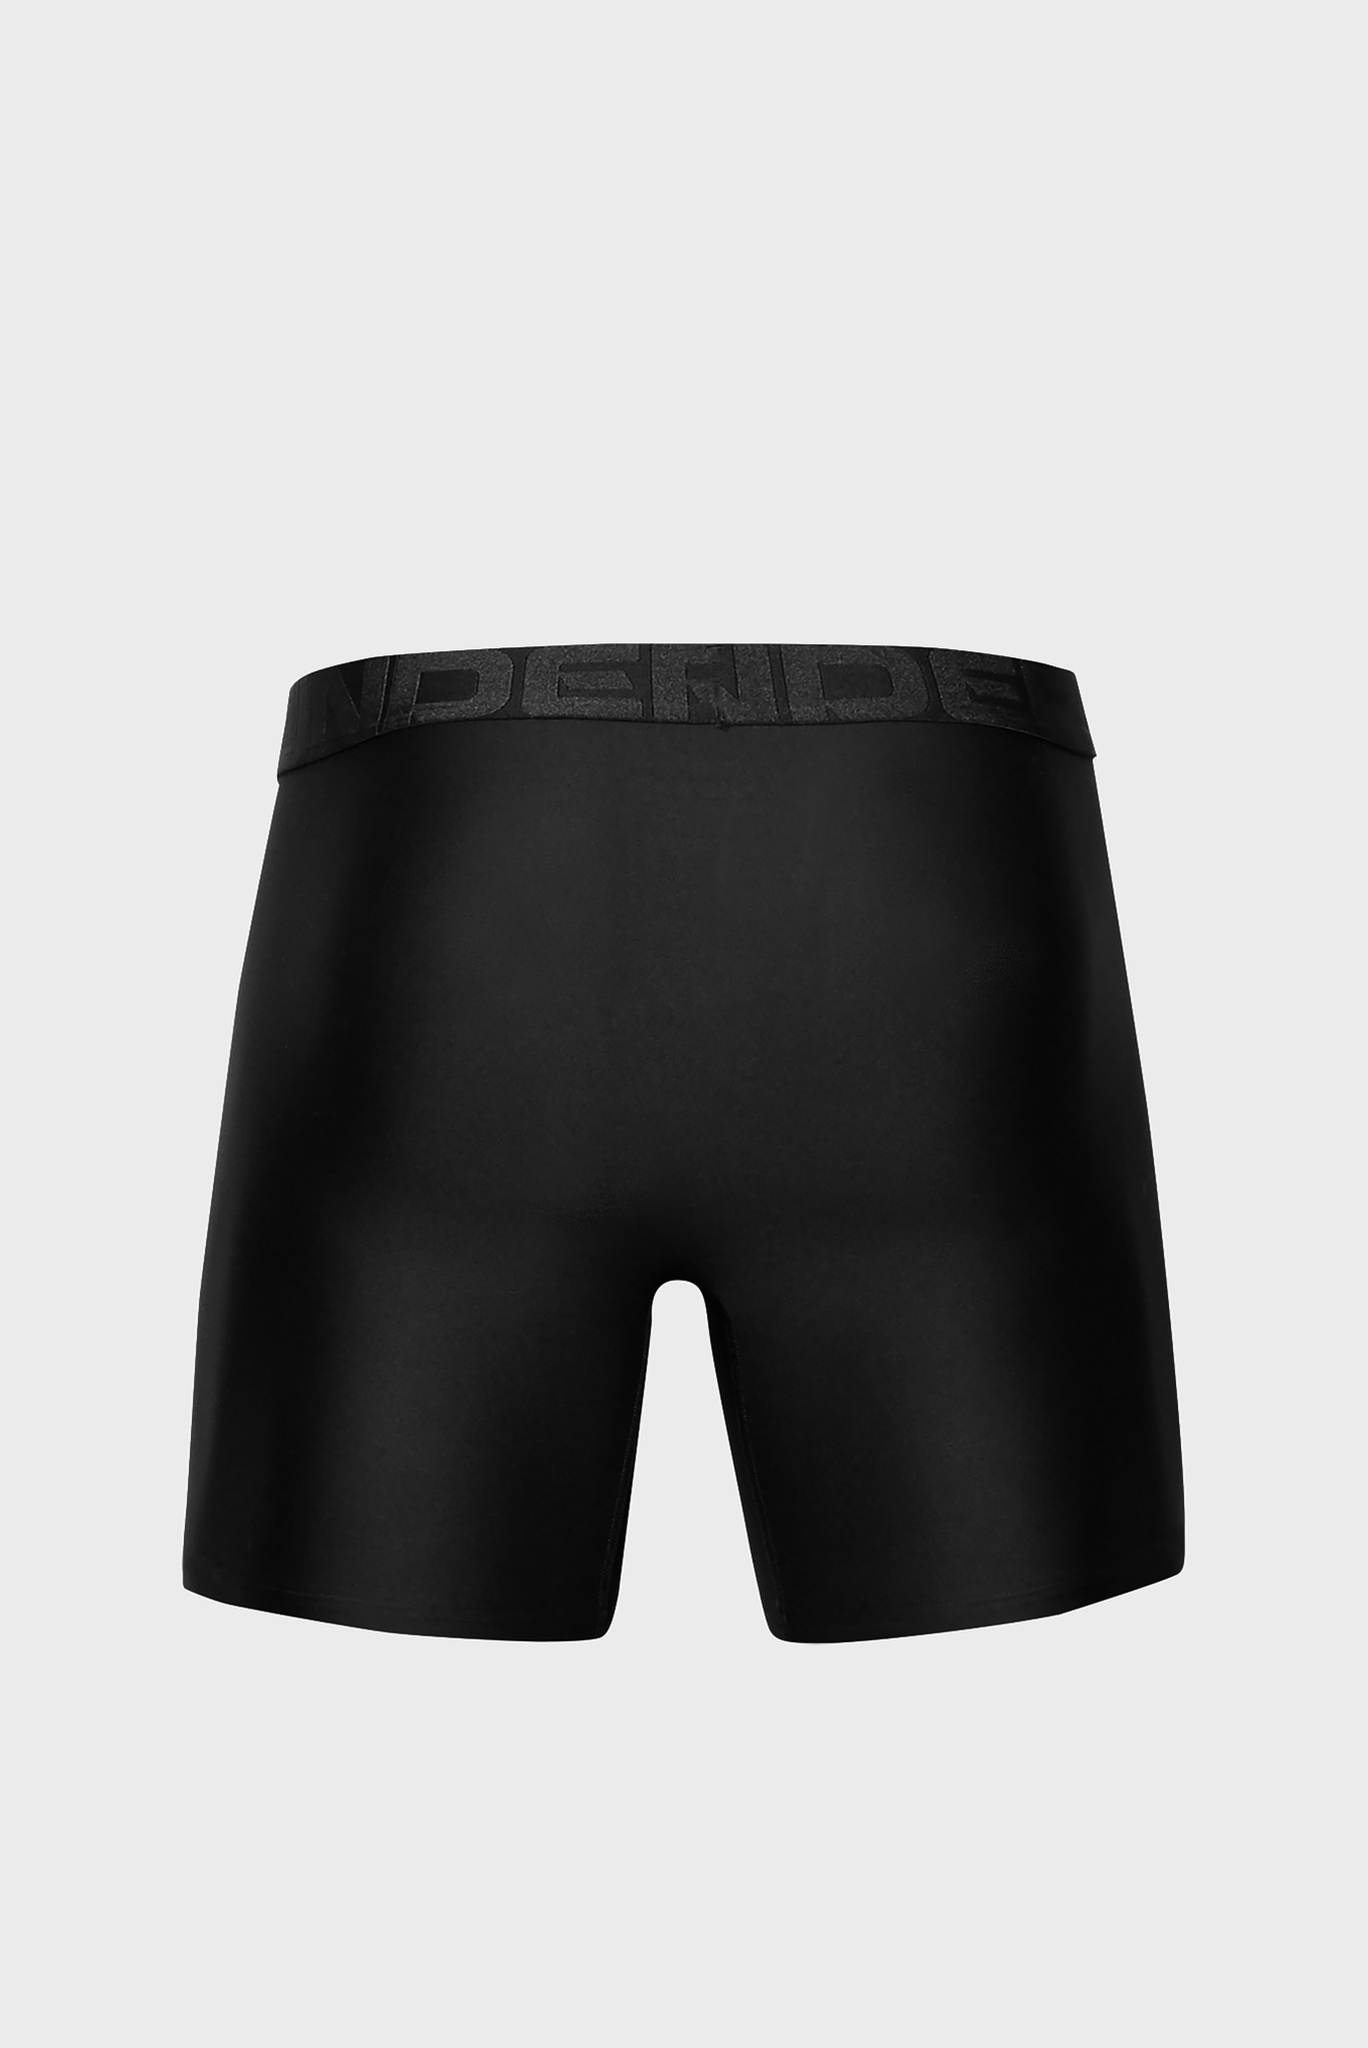 Мужские черные трус-боксеры (2 шт) Tech 6in 2 Pack Under Armour